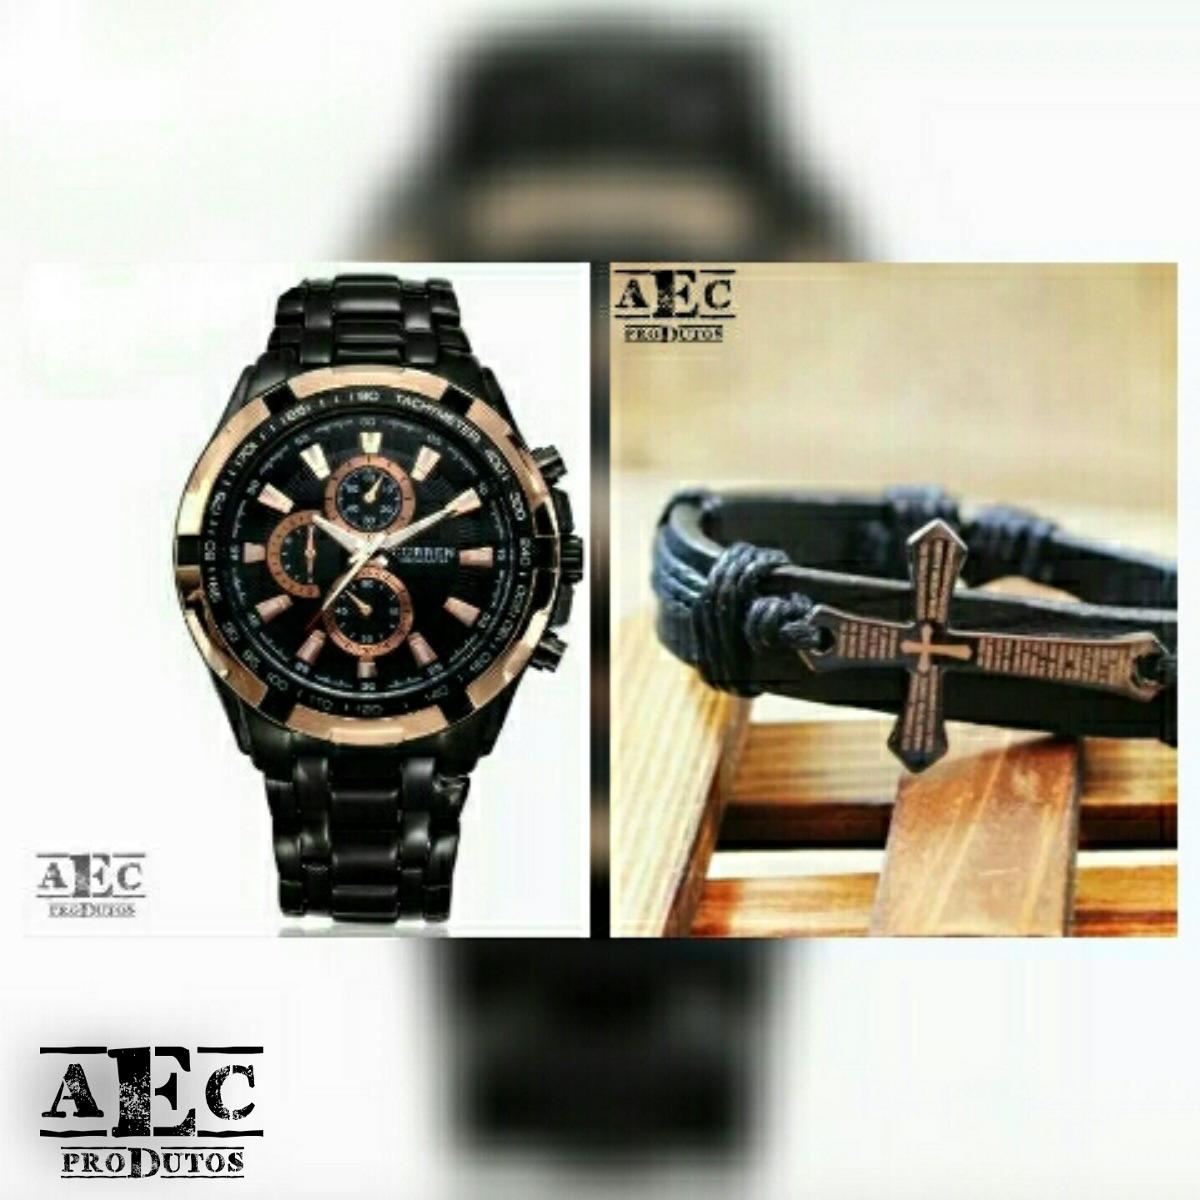 43c01788db5 Relógio Masculino Curren 8023 De Luxo Original Com Brinde - R  120 ...